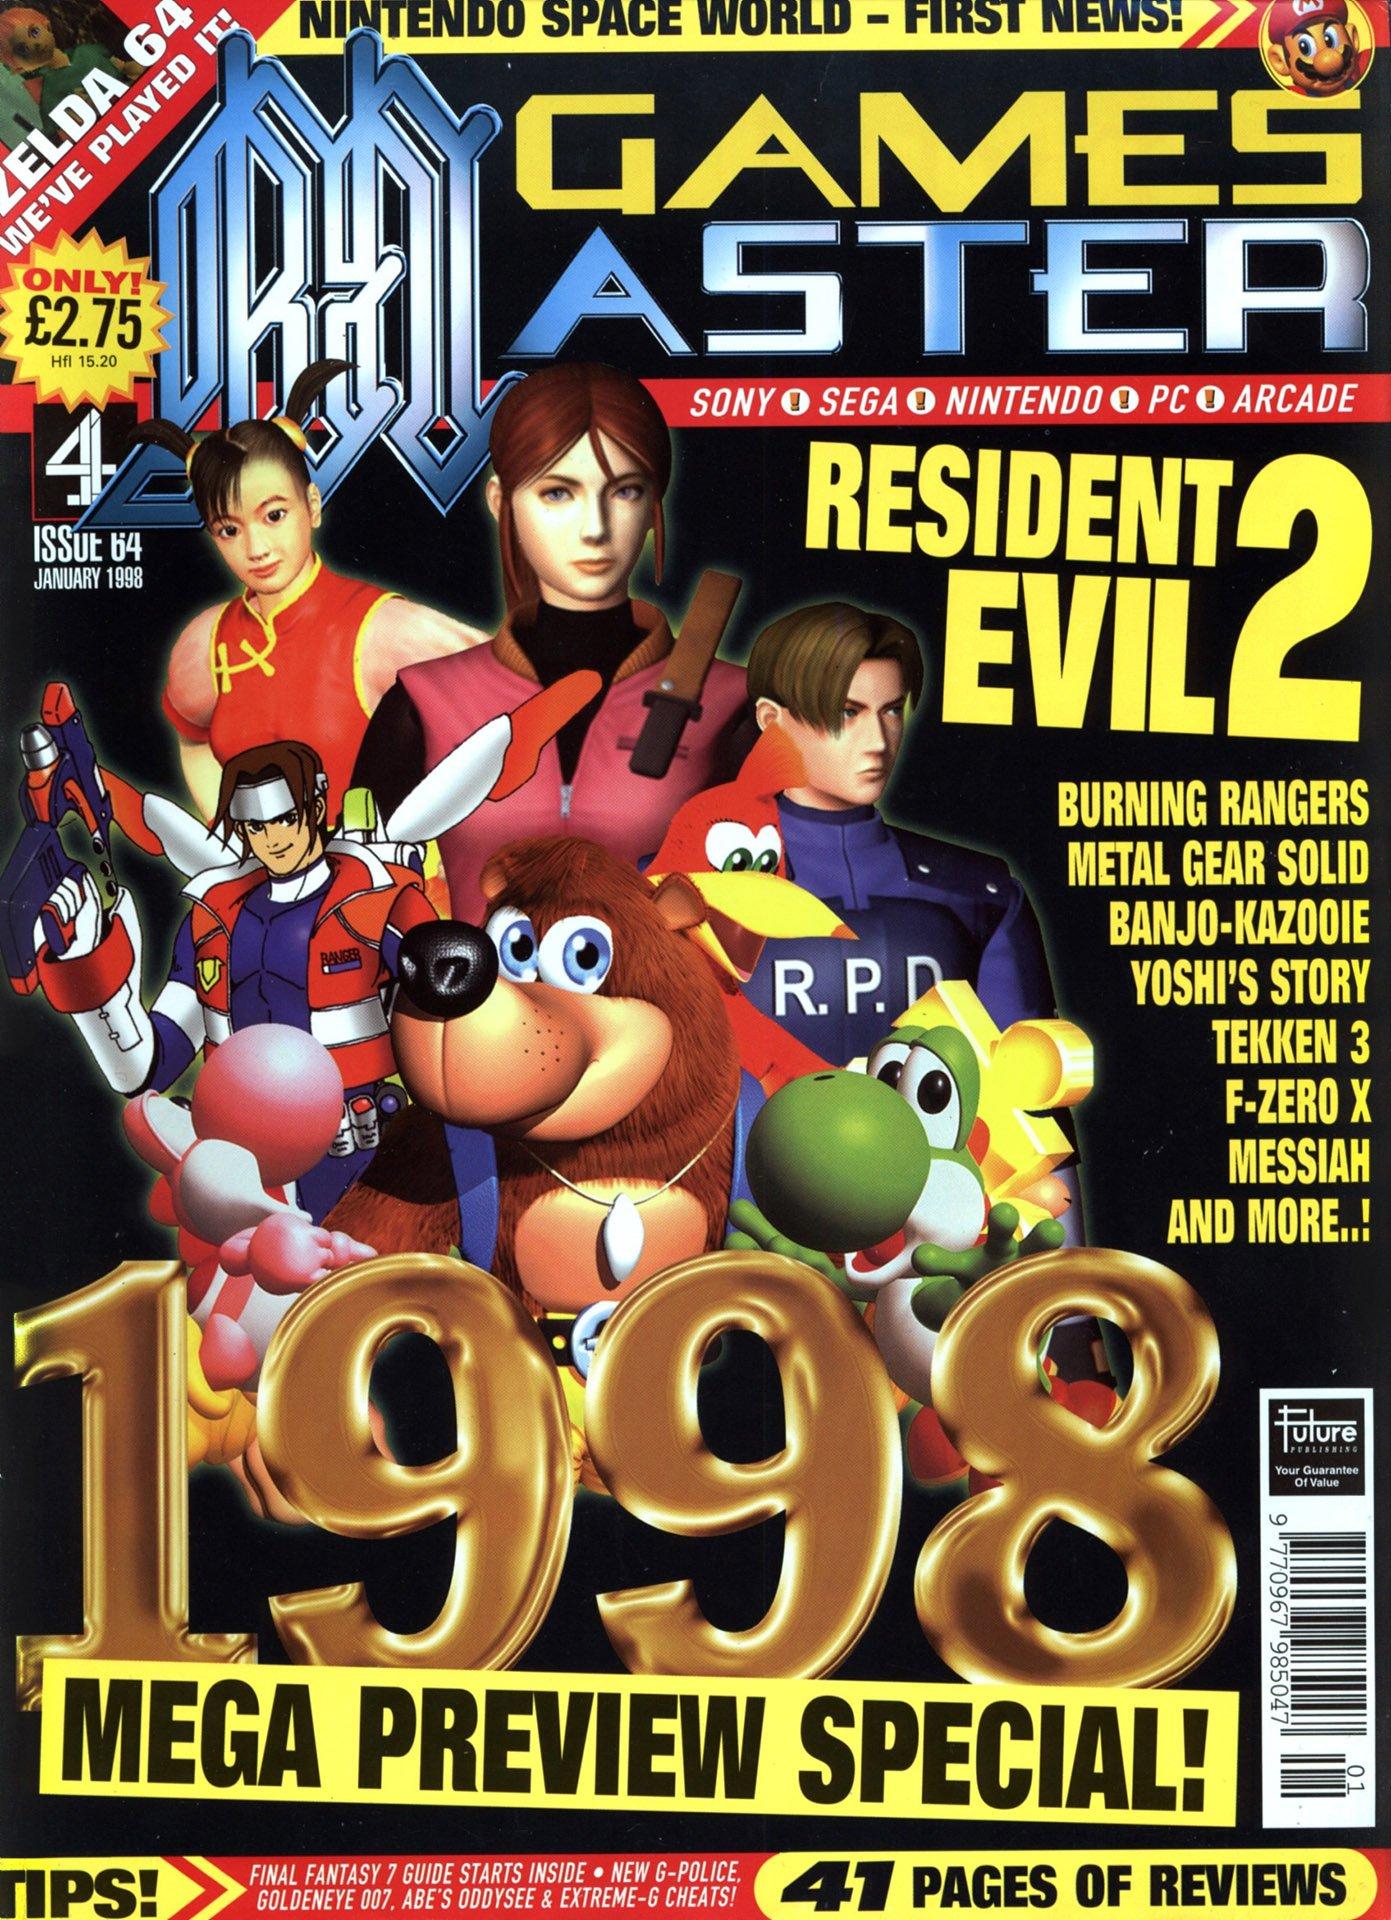 GamesMaster Issue 064 (January 1998)